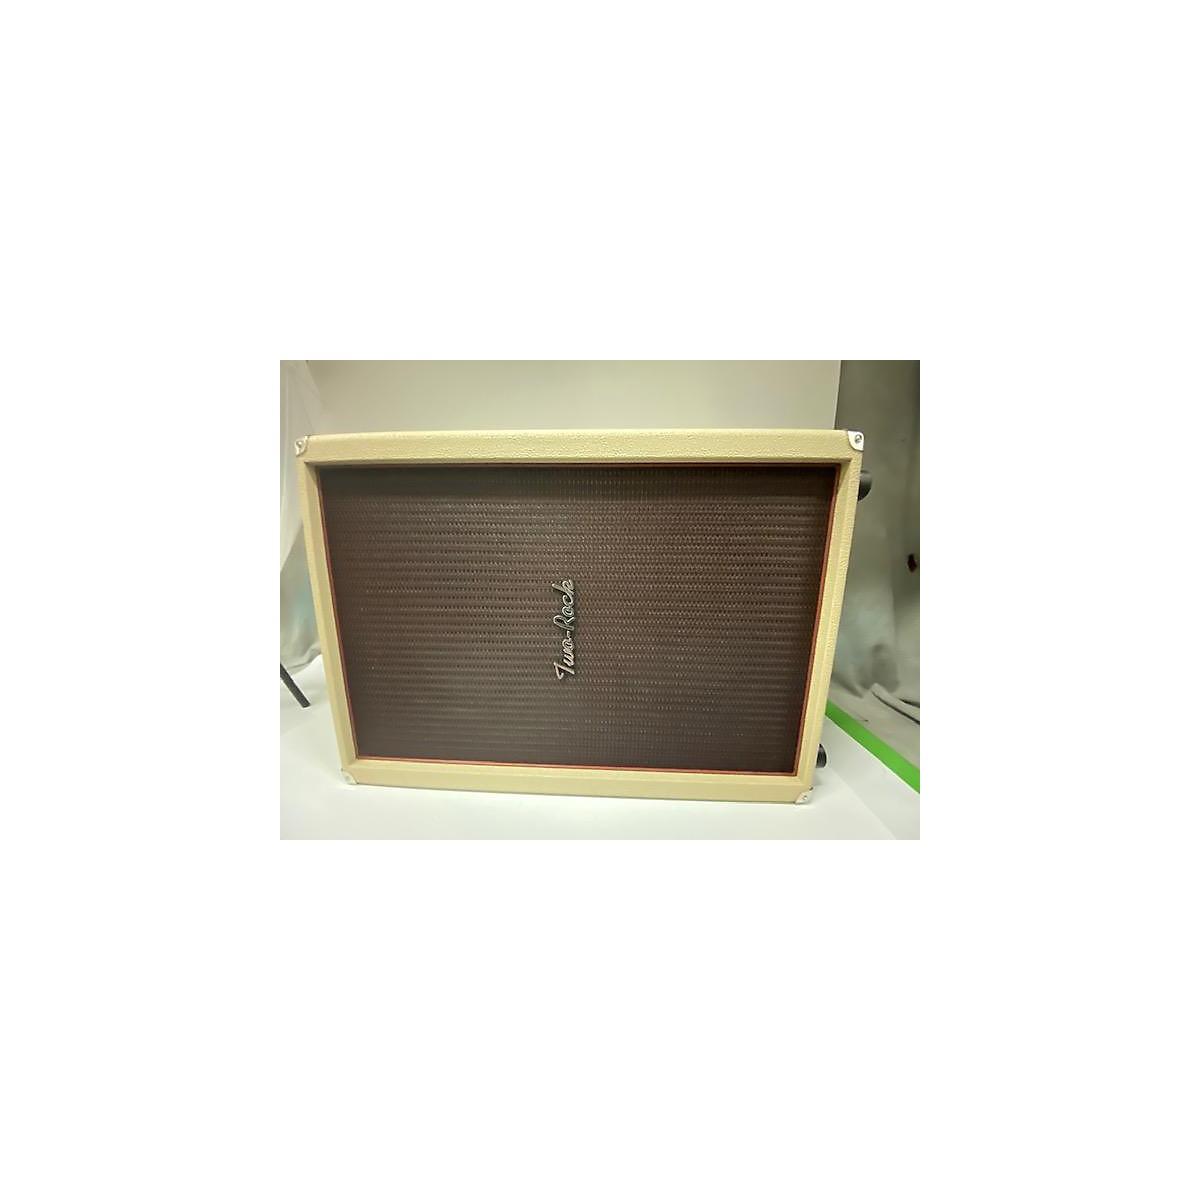 Two Rock BLONDE TOLEX 1265B Guitar Cabinet